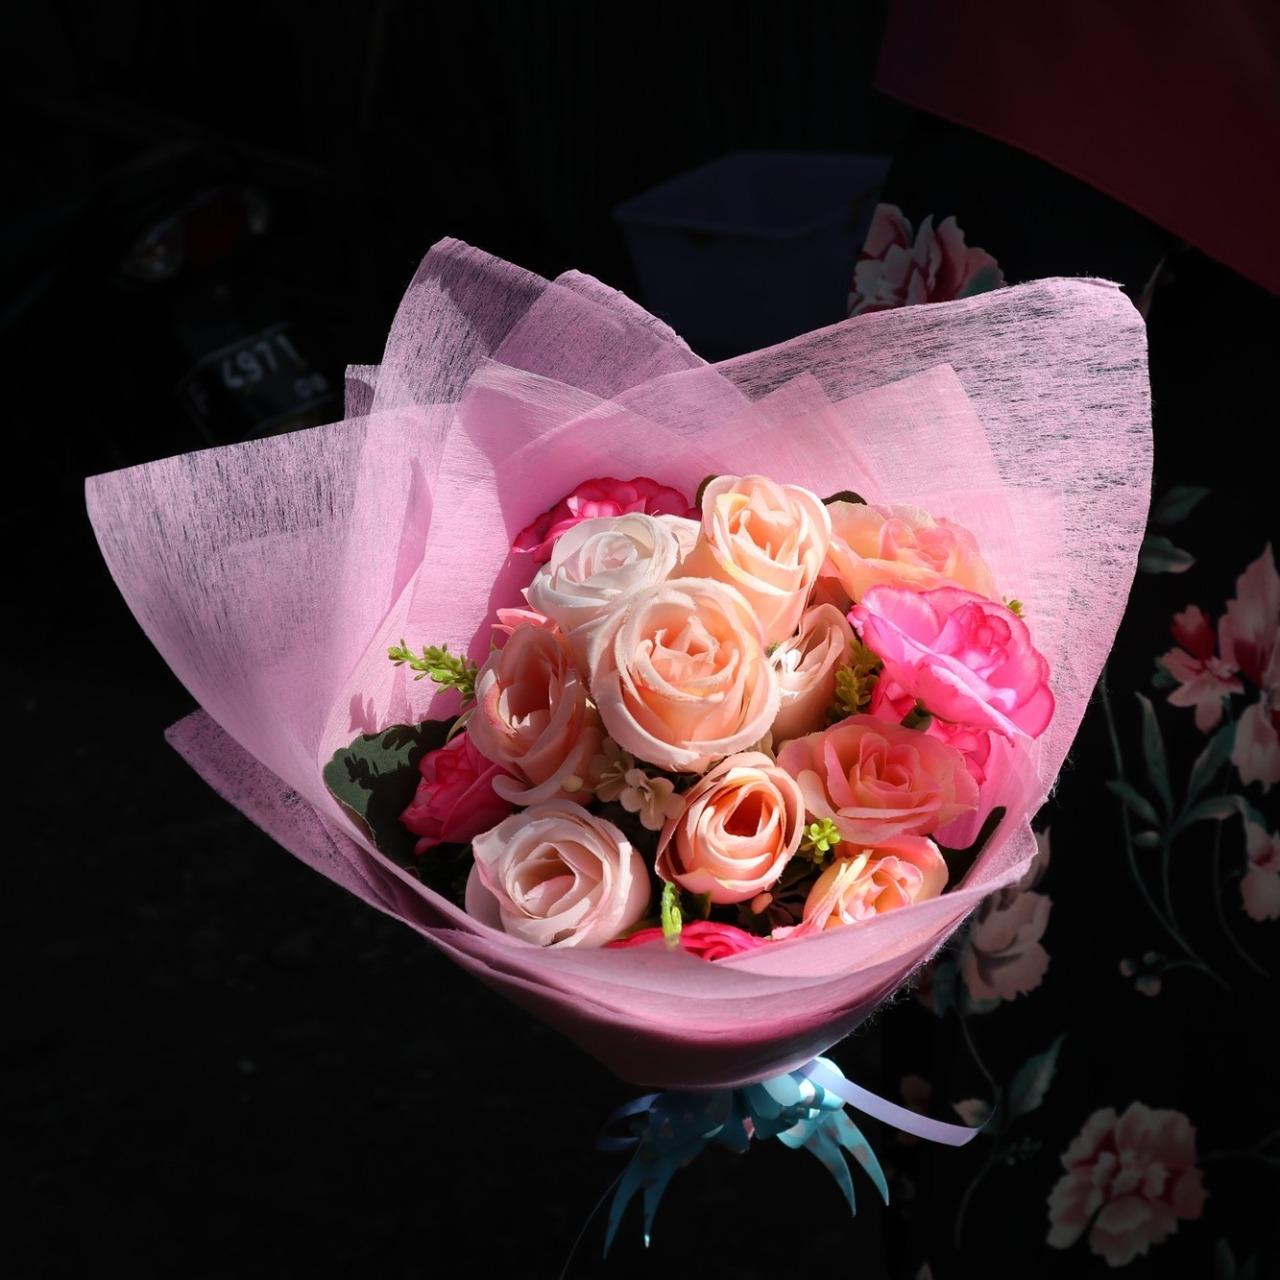 Vio Id Buket Bunga Artifisial Import Buket Bunga Mawar Cantik